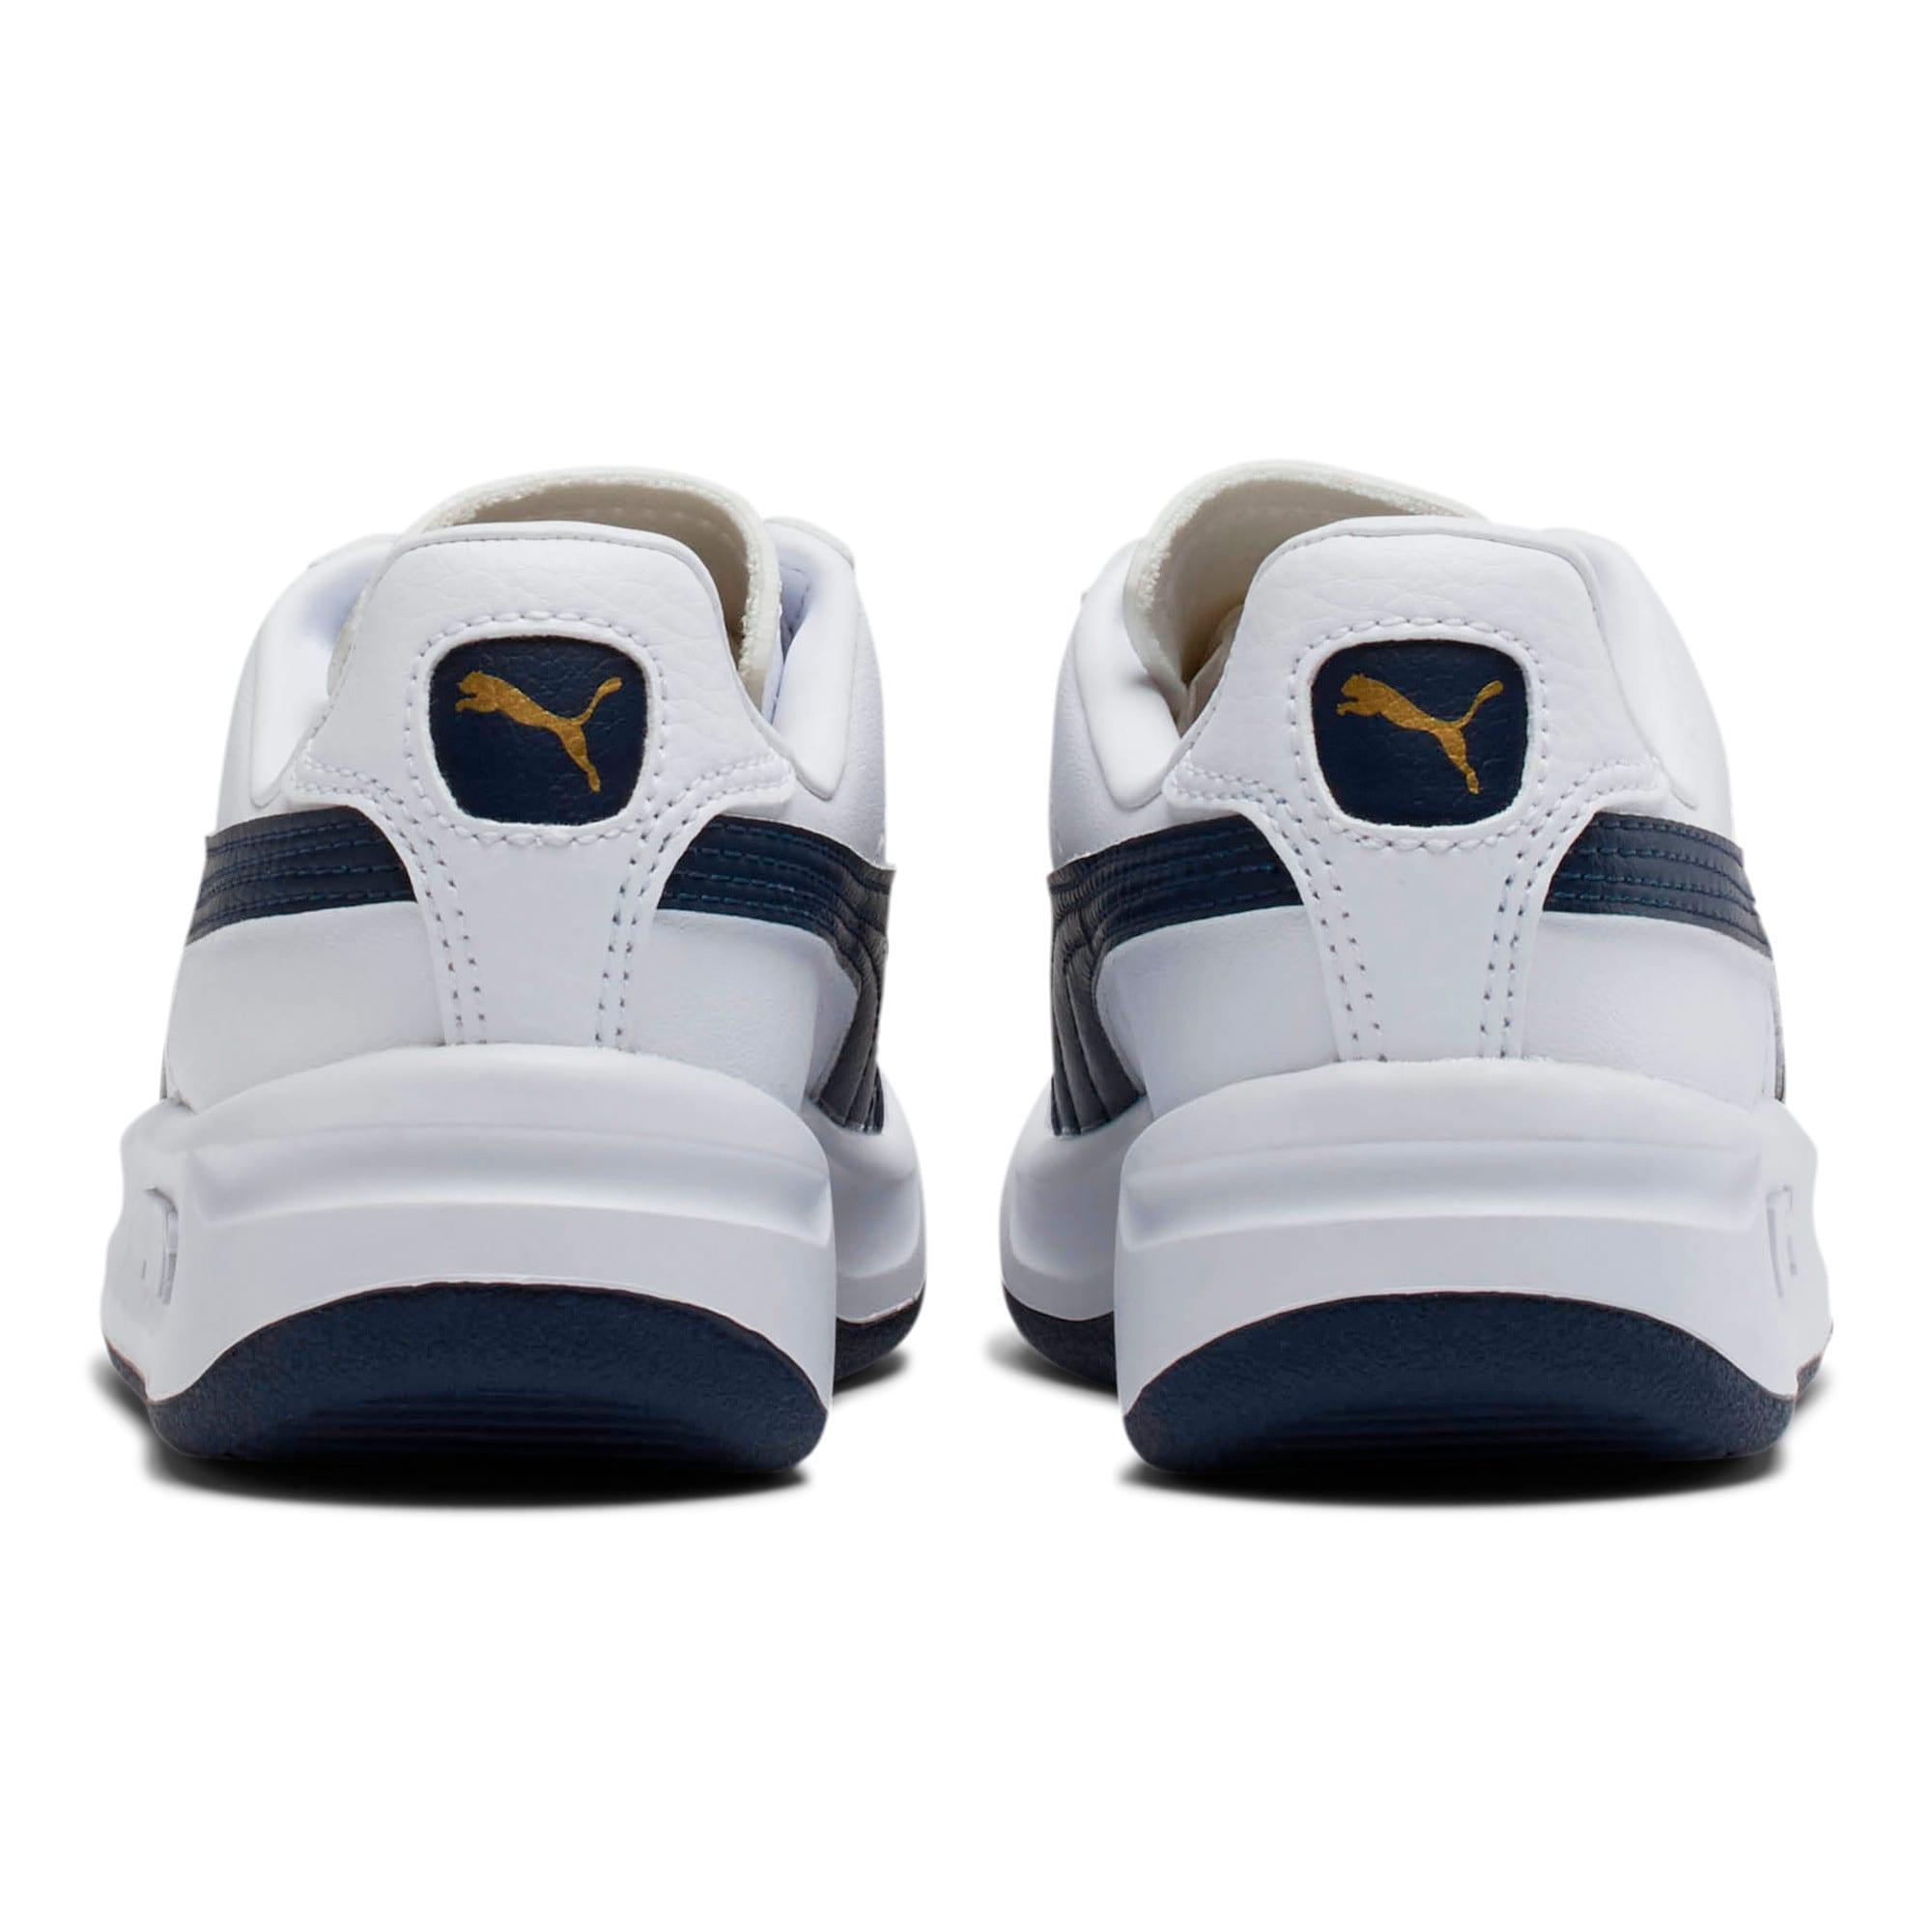 Thumbnail 4 of GV Special Little Kids' Shoes, Puma White-Peacoat, medium